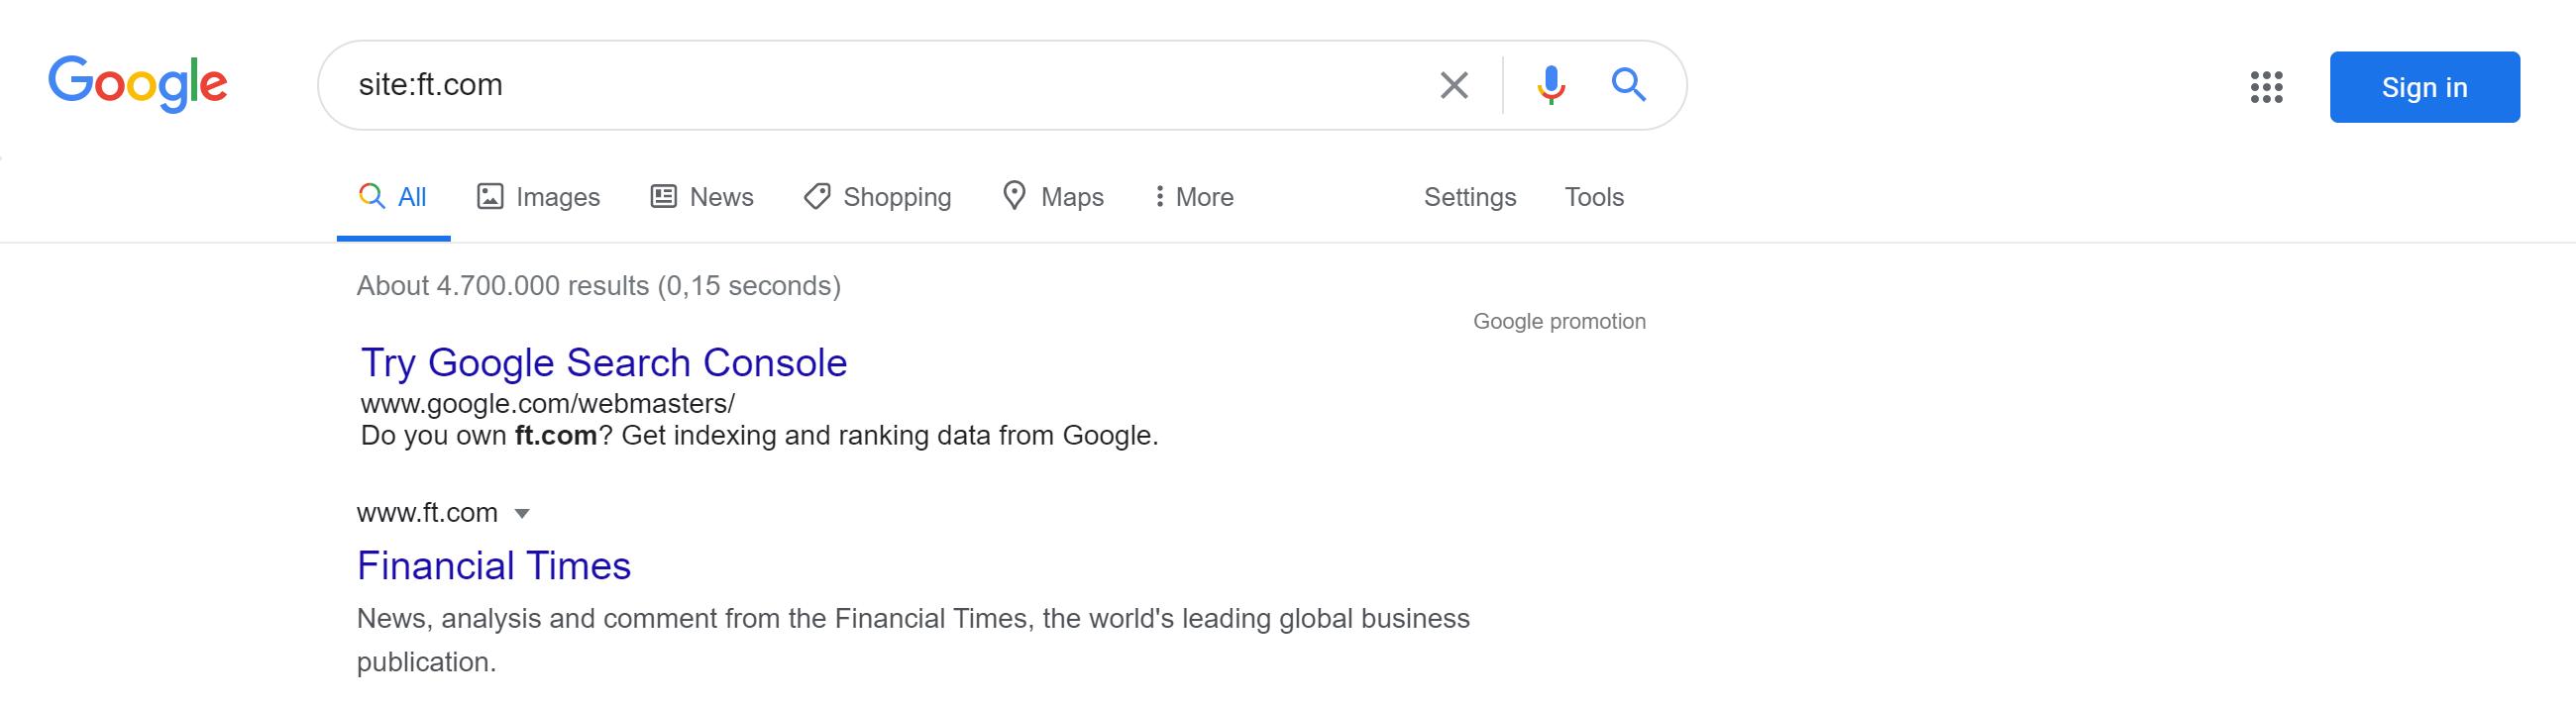 Site URLs